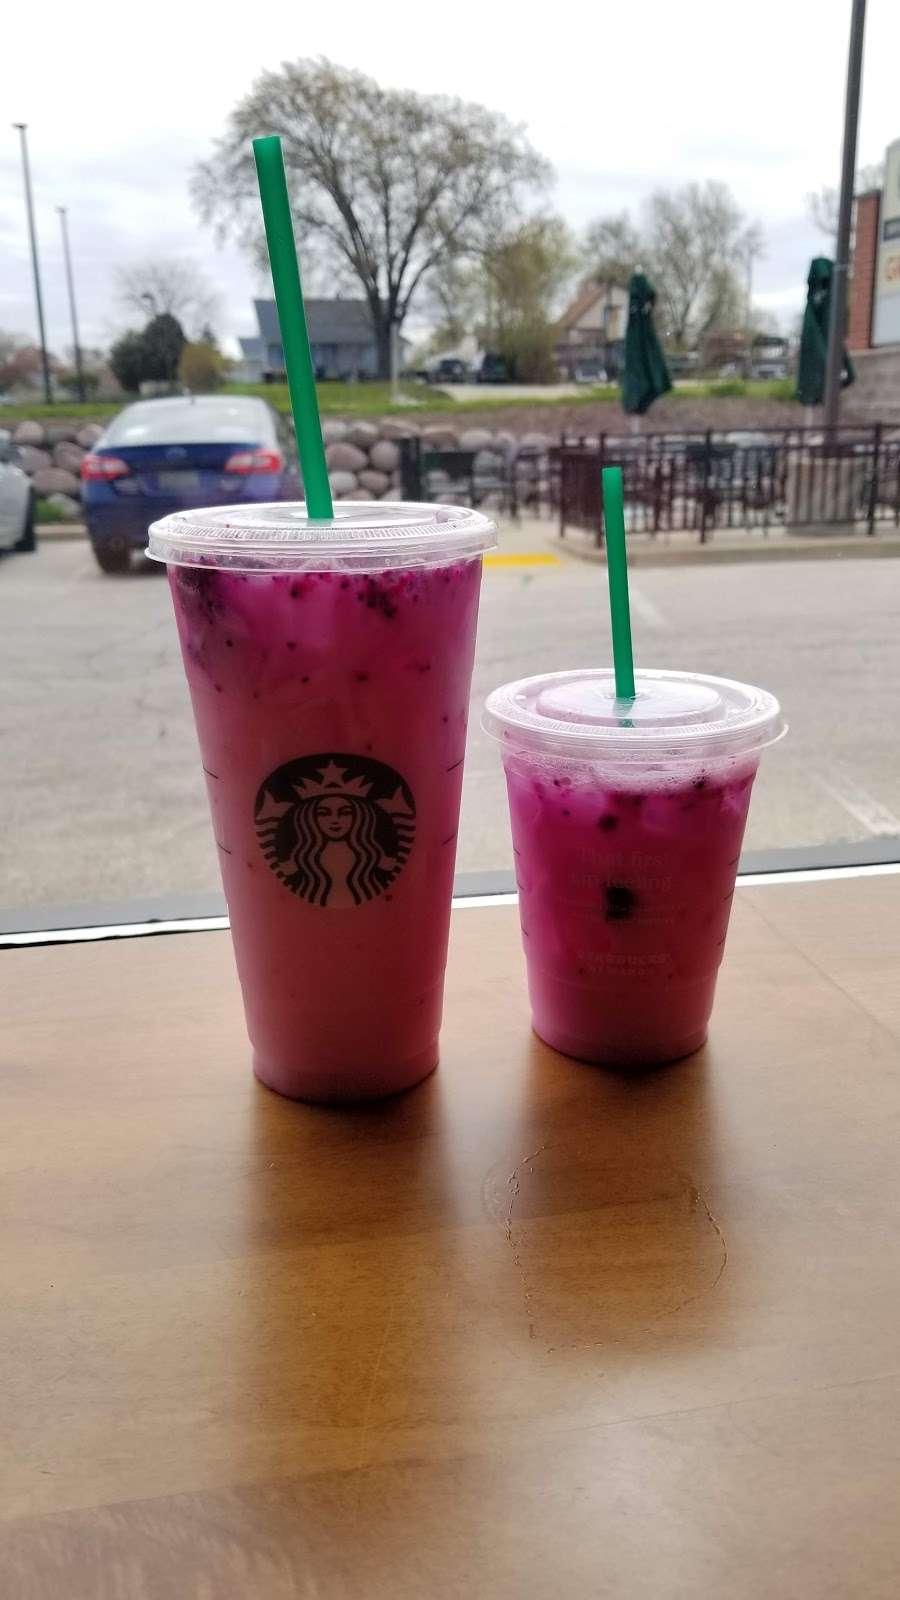 Starbucks - cafe  | Photo 7 of 10 | Address: 6537 S 27th St A, Franklin, WI 53132, USA | Phone: (414) 304-7208